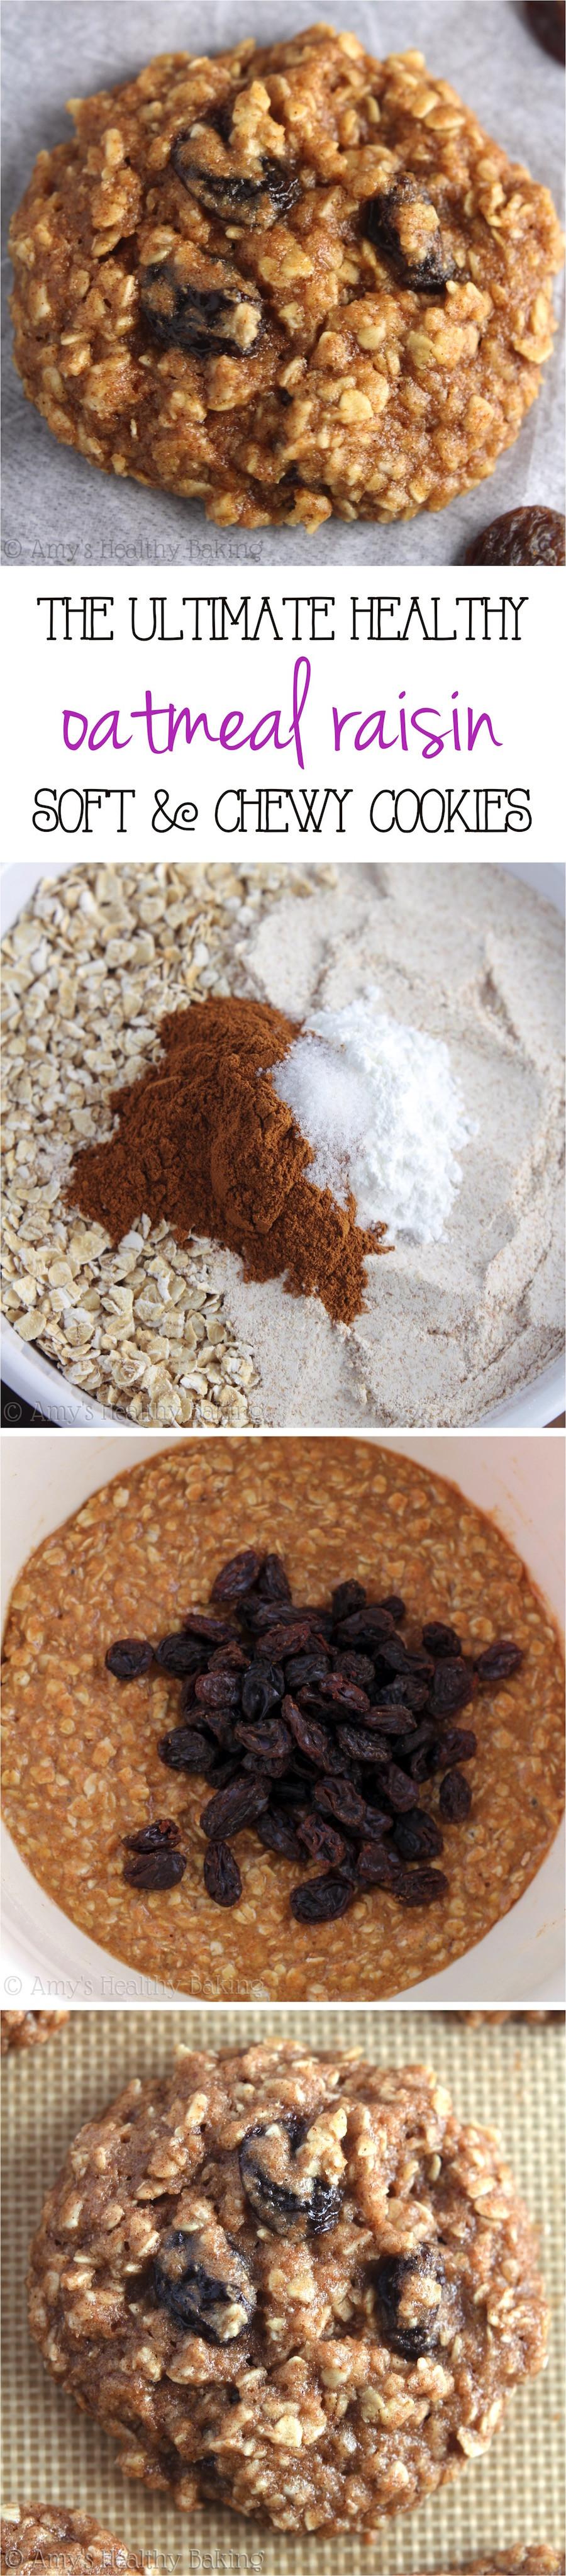 Oatmeal Raisin Cookies Recipe Healthy  The Ultimate Healthy Soft & Chewy Oatmeal Raisin Cookies